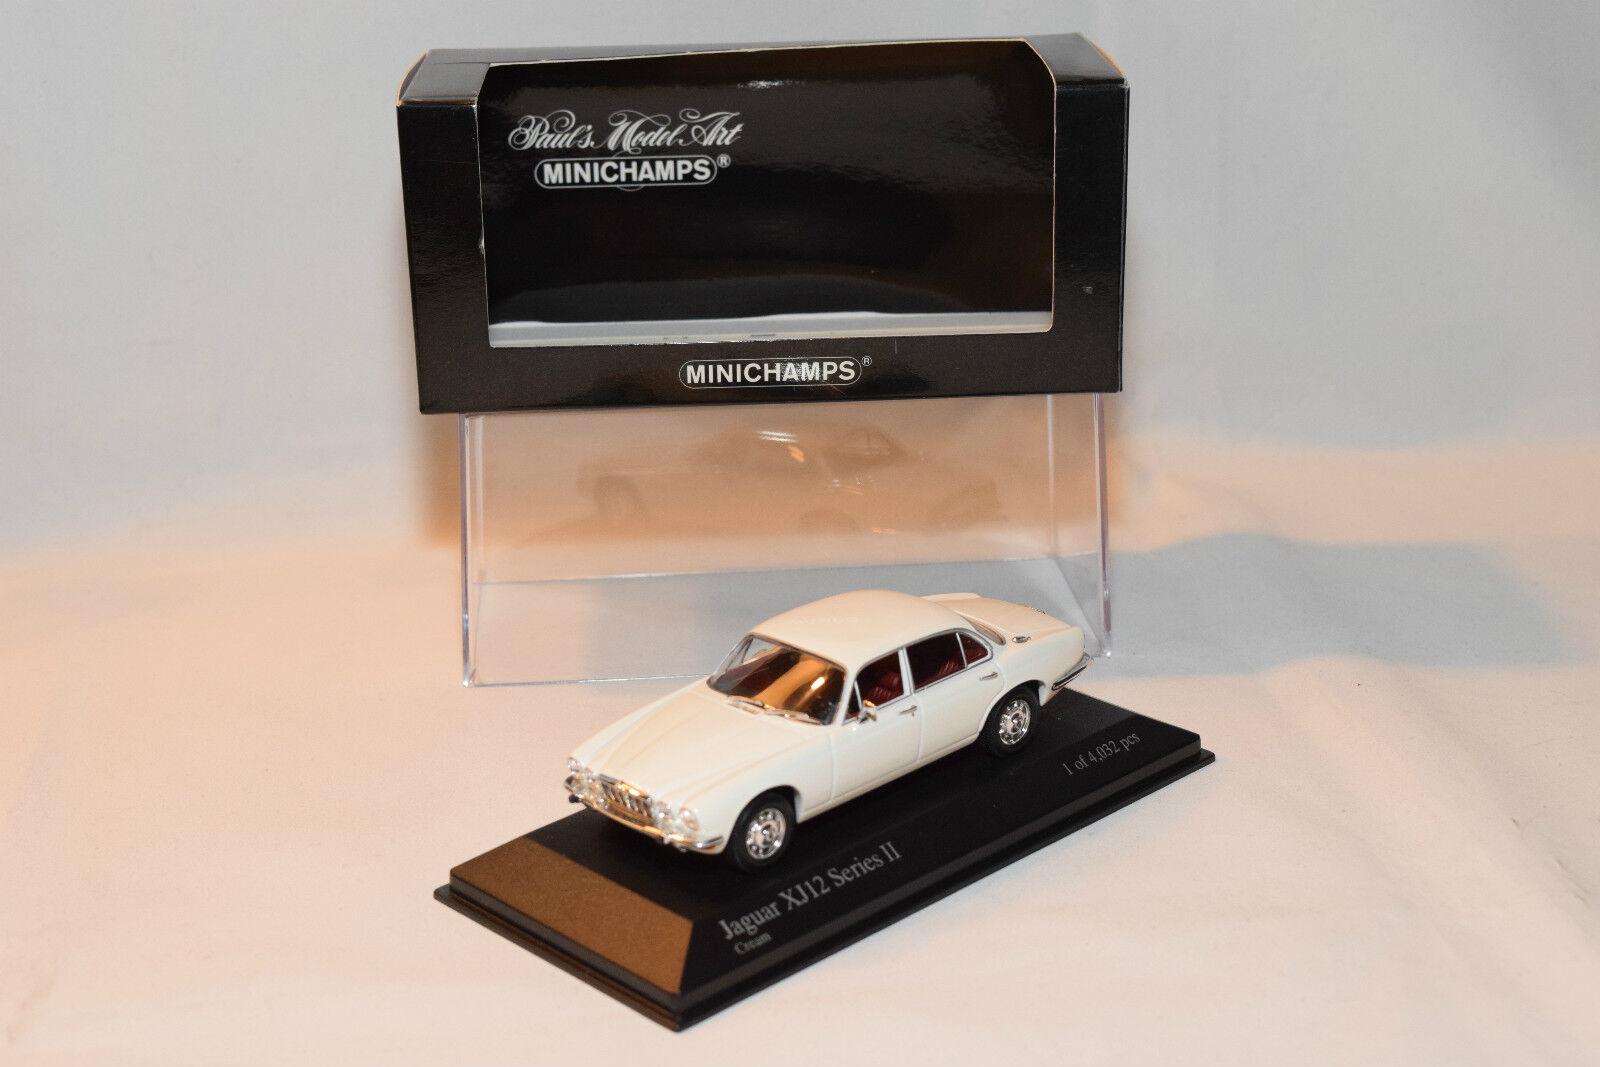 . MINICHAMPS JAGUAR XJ12 XJ 12 SERIES II 1975 CREAM MINT BOXED RARE SELTEN